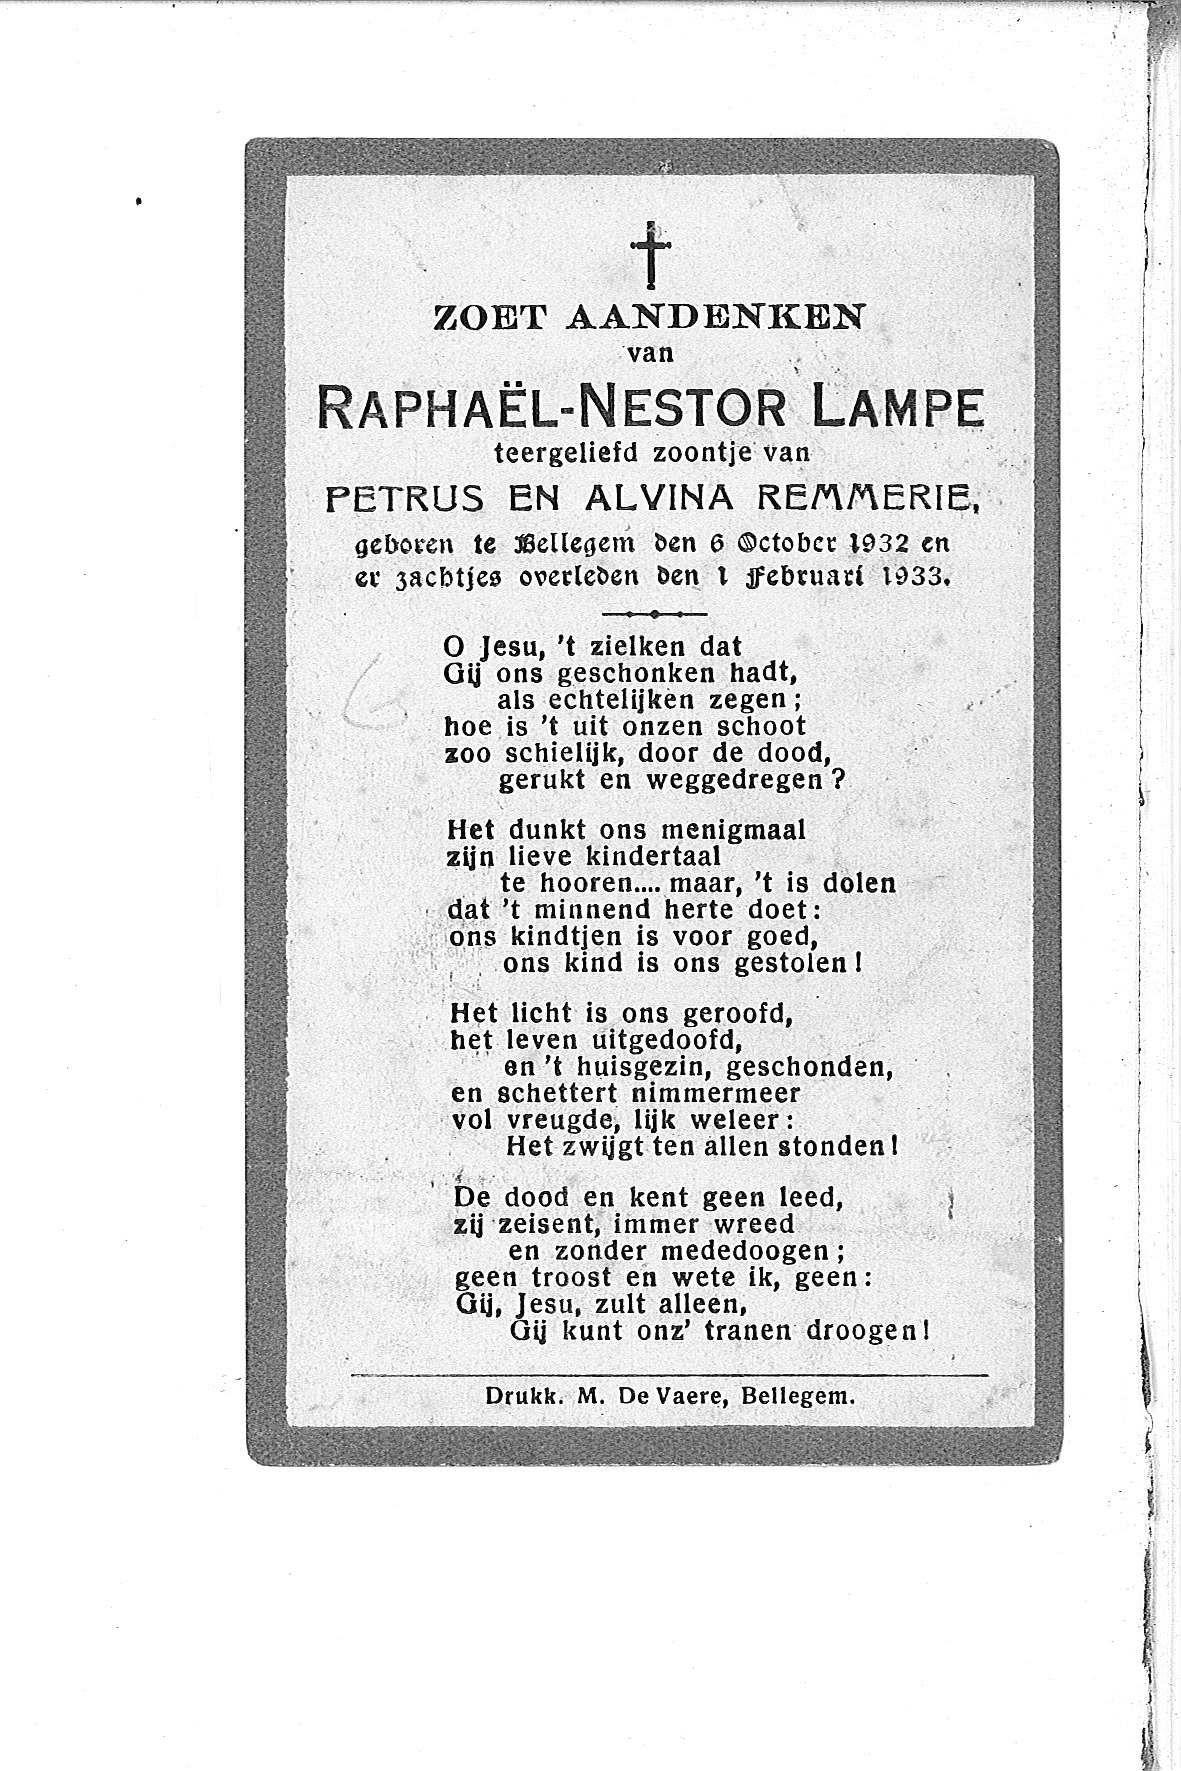 Raphael-Nestor20110816140049_00020.jpg